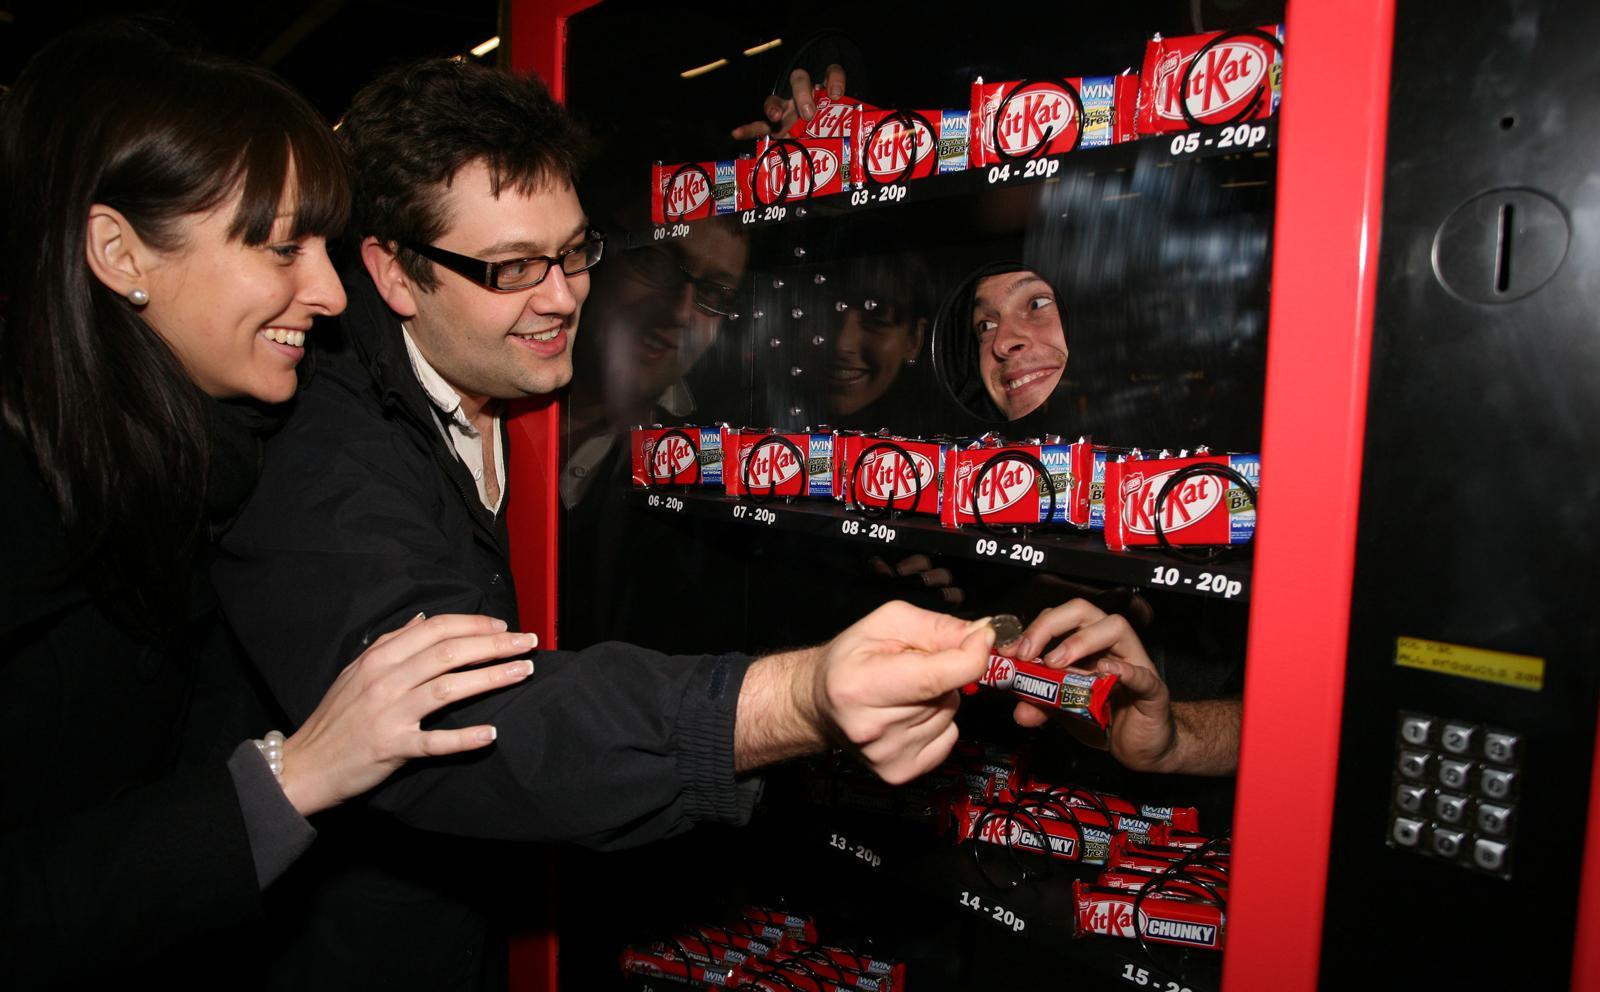 Kit Kat Ambient Ad -  Human vending machine